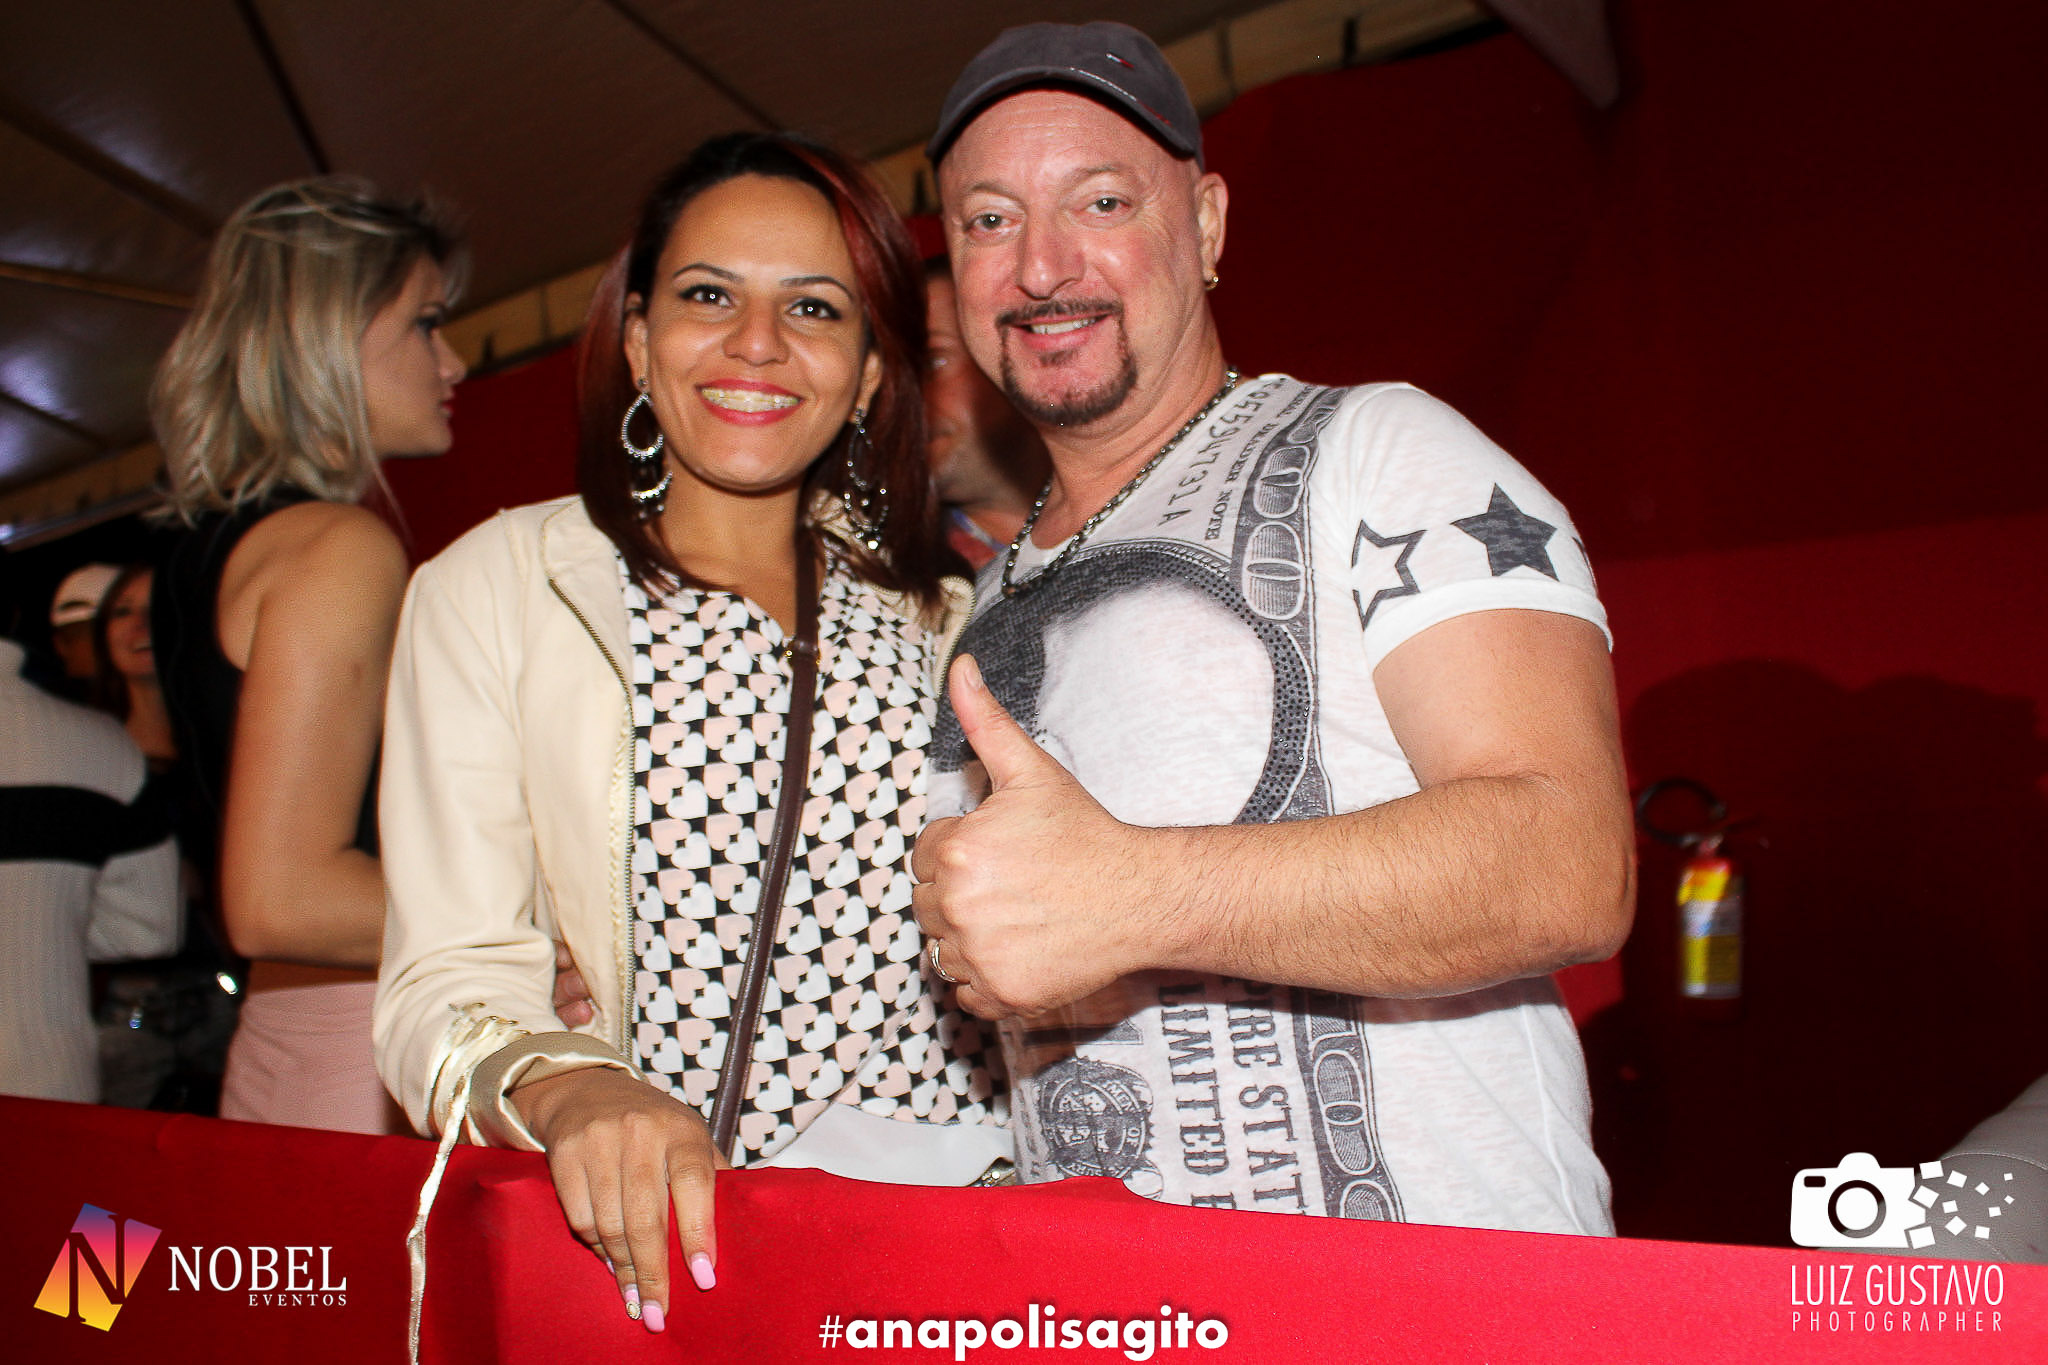 Luiz Gustavo Photographer-32